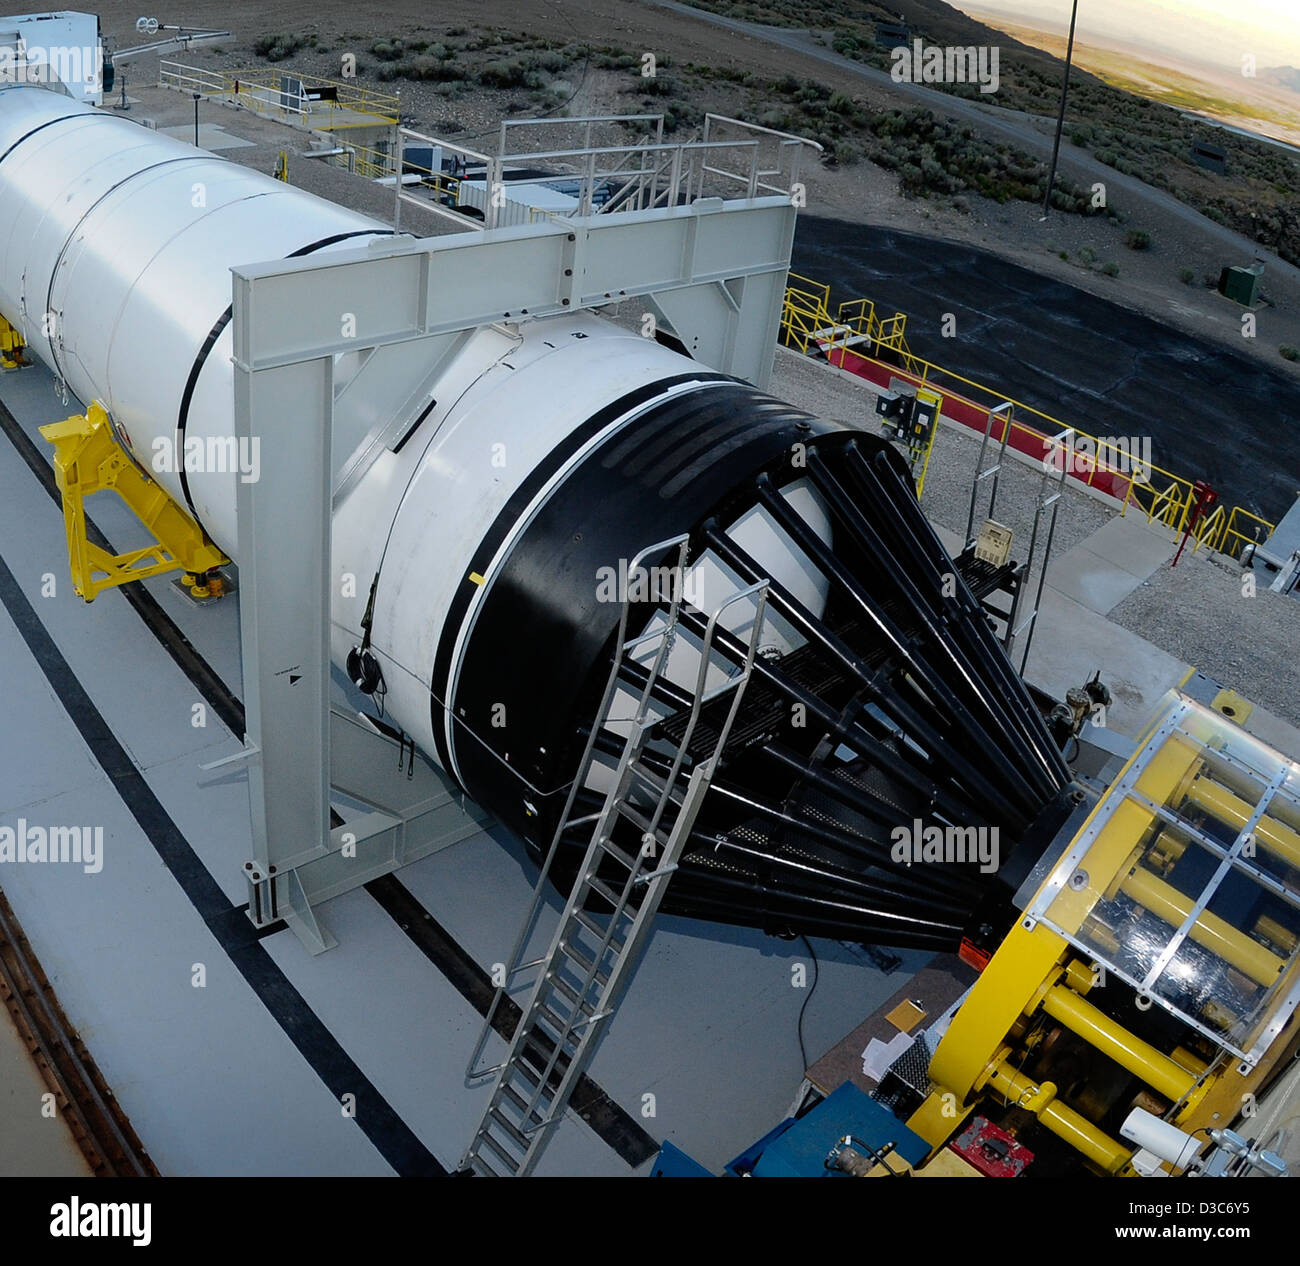 Ares I Rocket: 3.6 Million Pounds of Thrust! (NASA, Ares, 8/21/09) - Stock Image